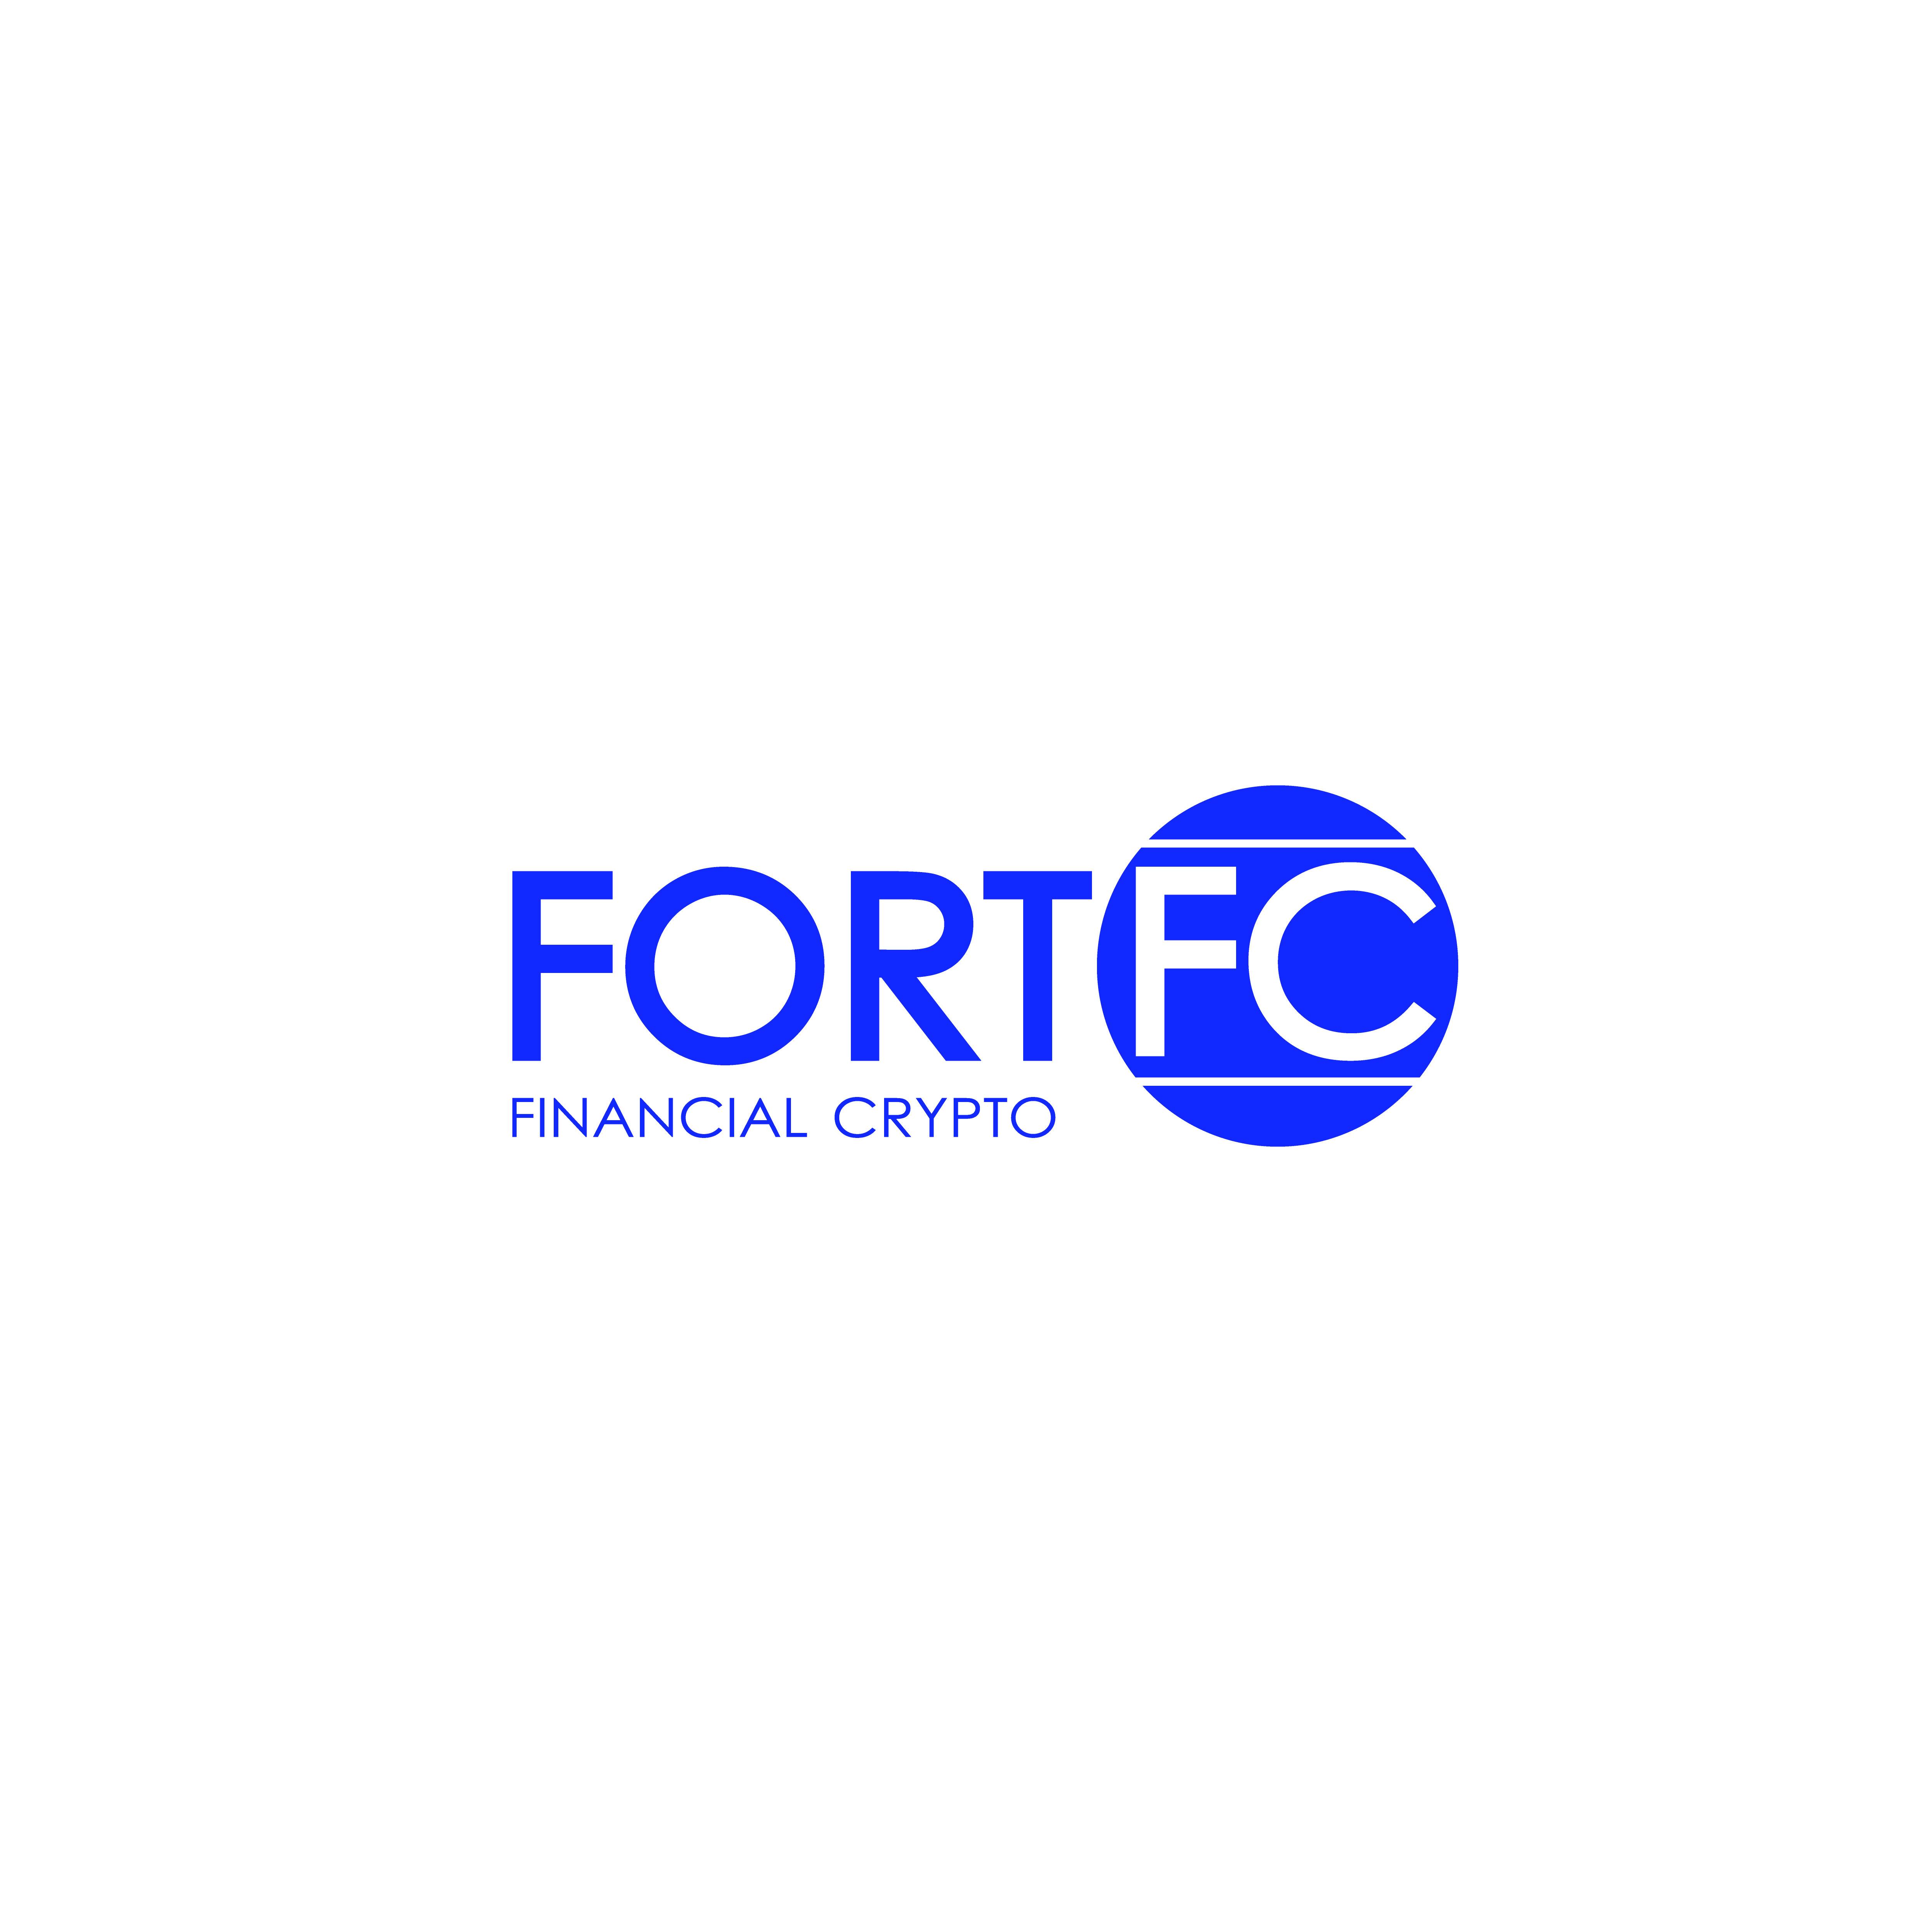 Разработка логотипа финансовой компании фото f_5485a8454c2cbb2a.jpg